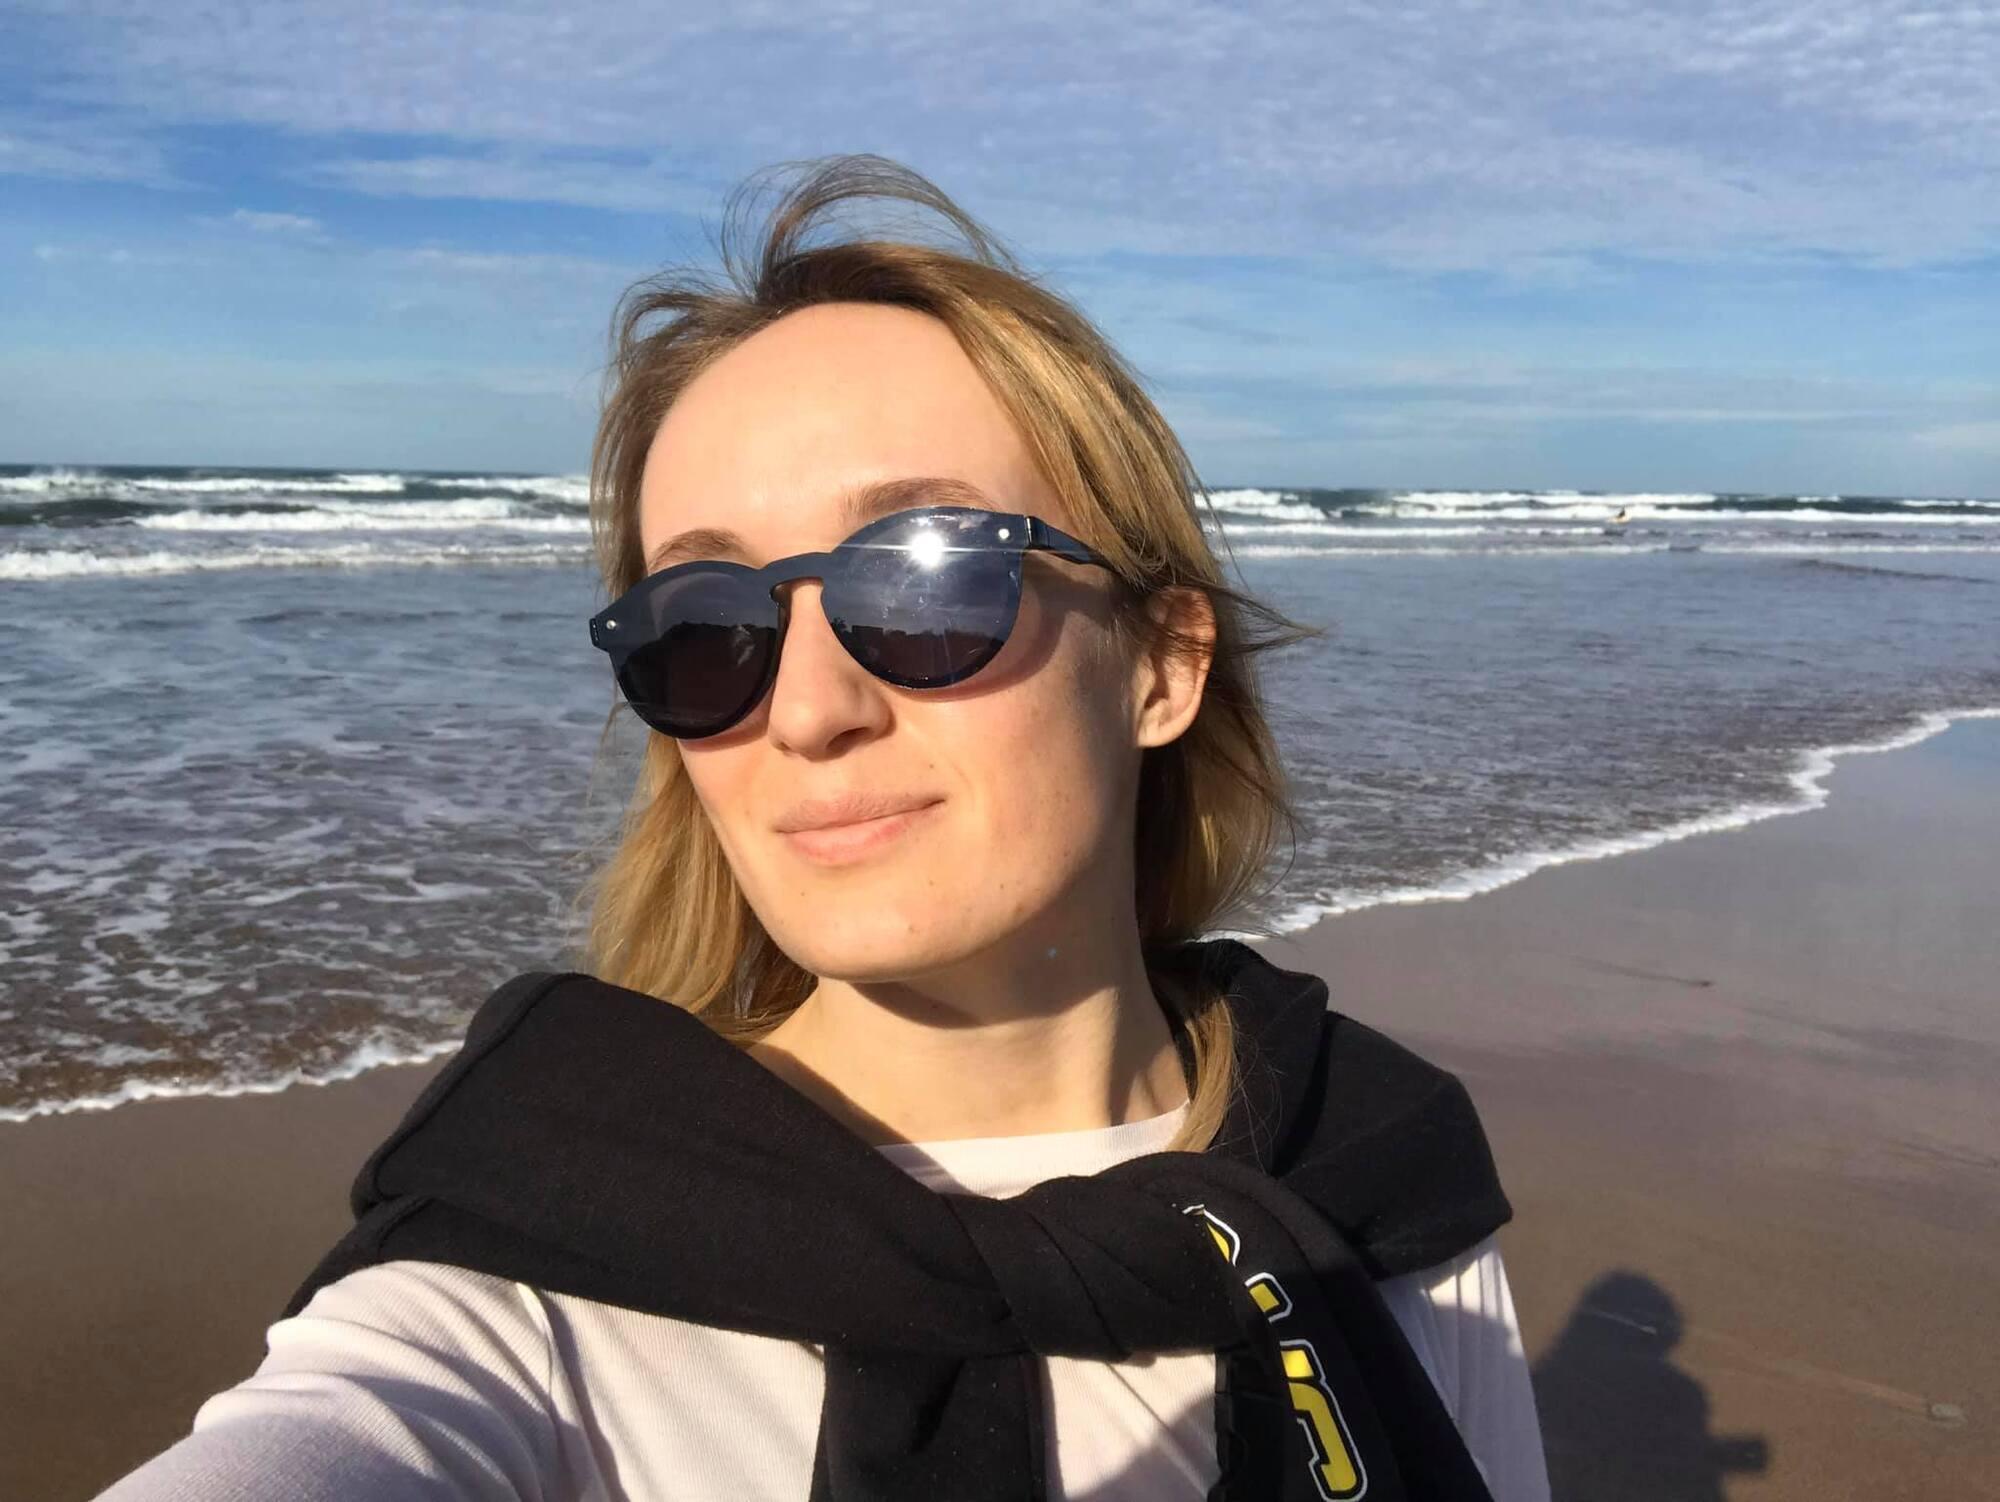 Елена Денисенко погибла в ДТП